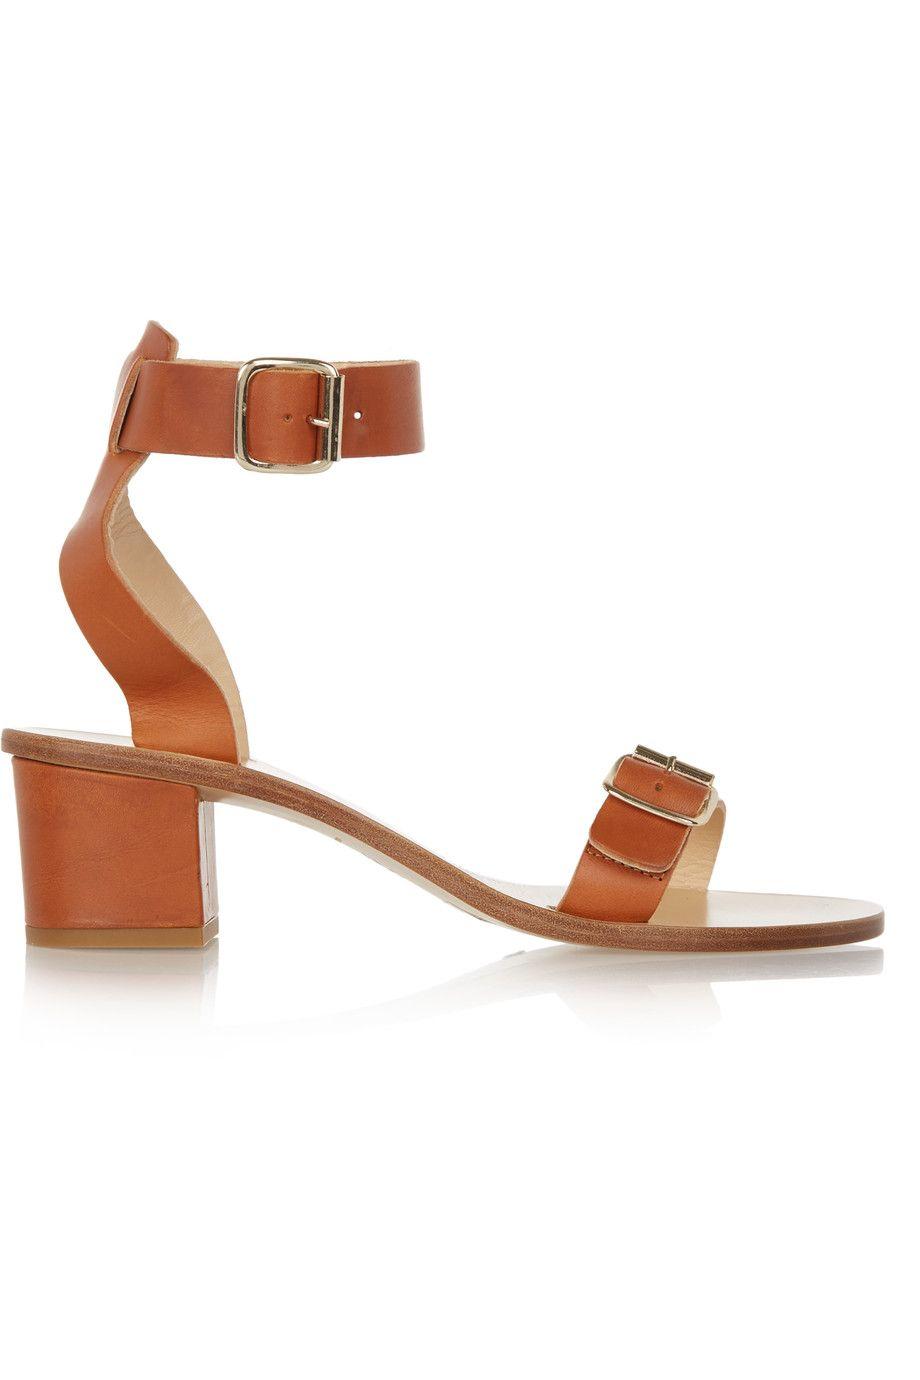 ATP Atelier Carmen Leather Sandals - Tan Factory Outlet 8OORCsZz